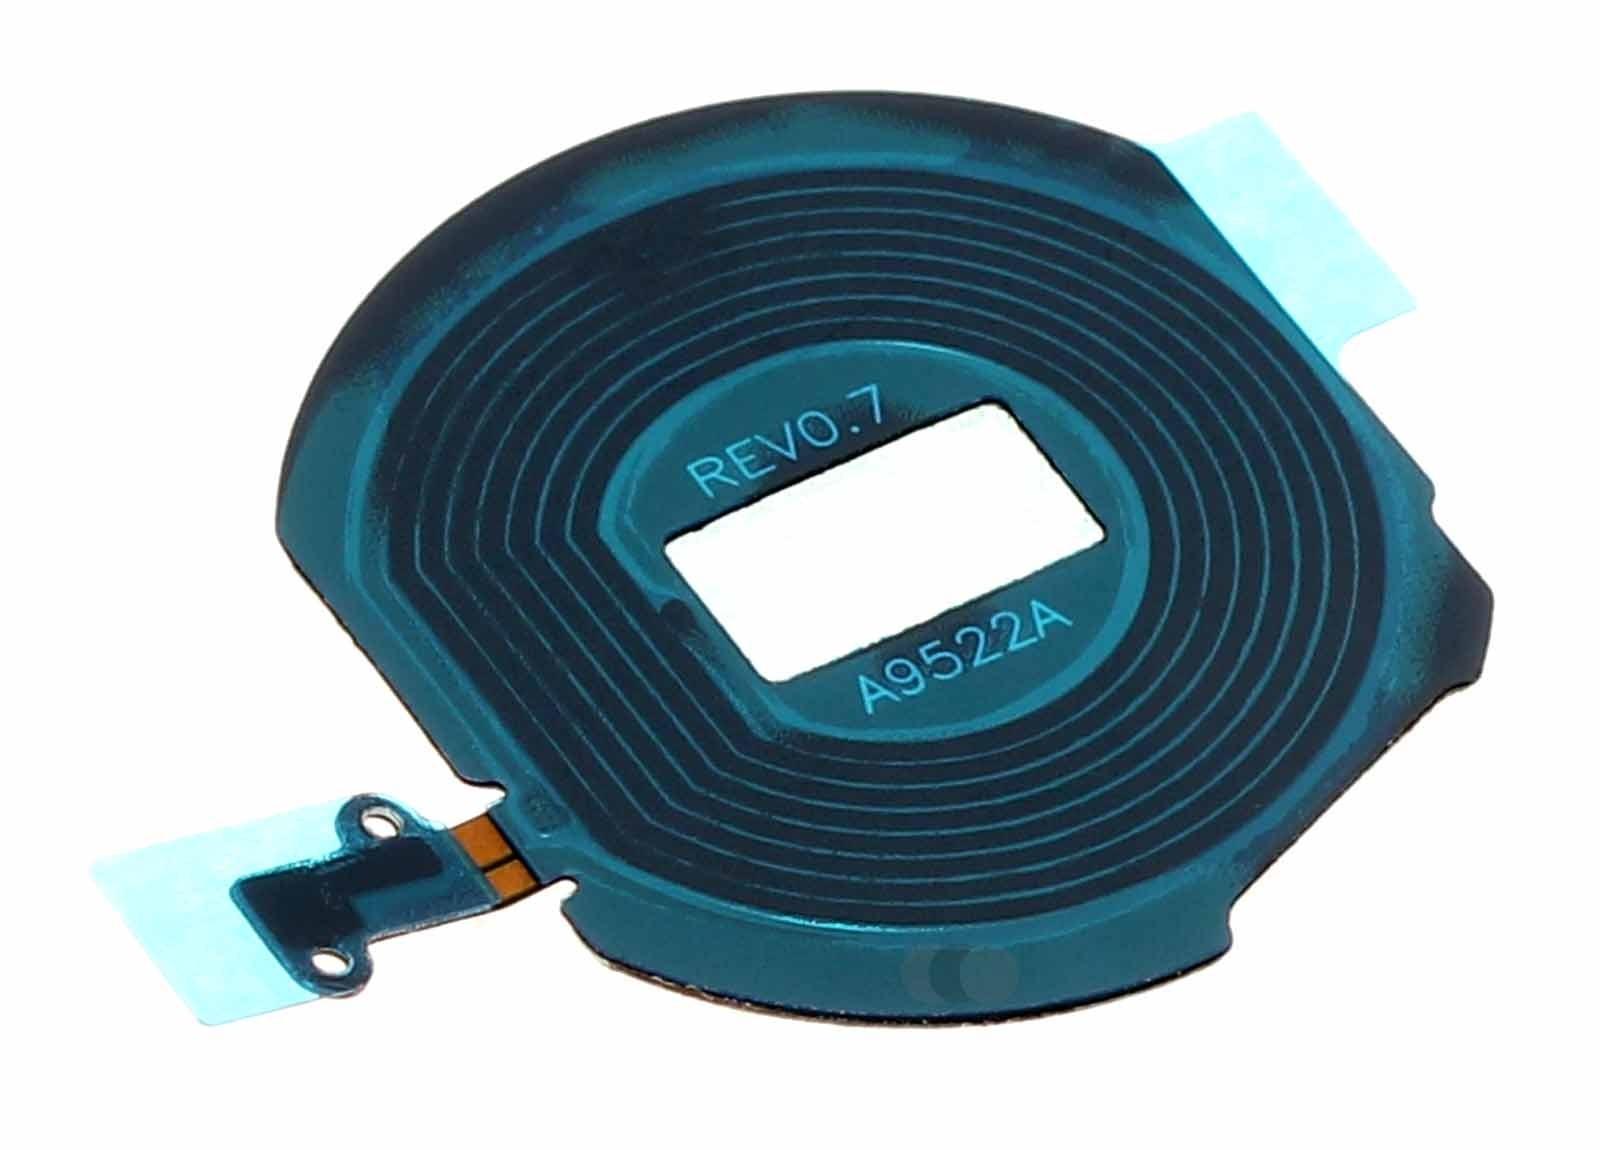 Original Samsung Bluetooth Antenne für Samsung Gear S3 Smartwatch, Wearable, Ersatzteil Teilenummer GH42-05872A